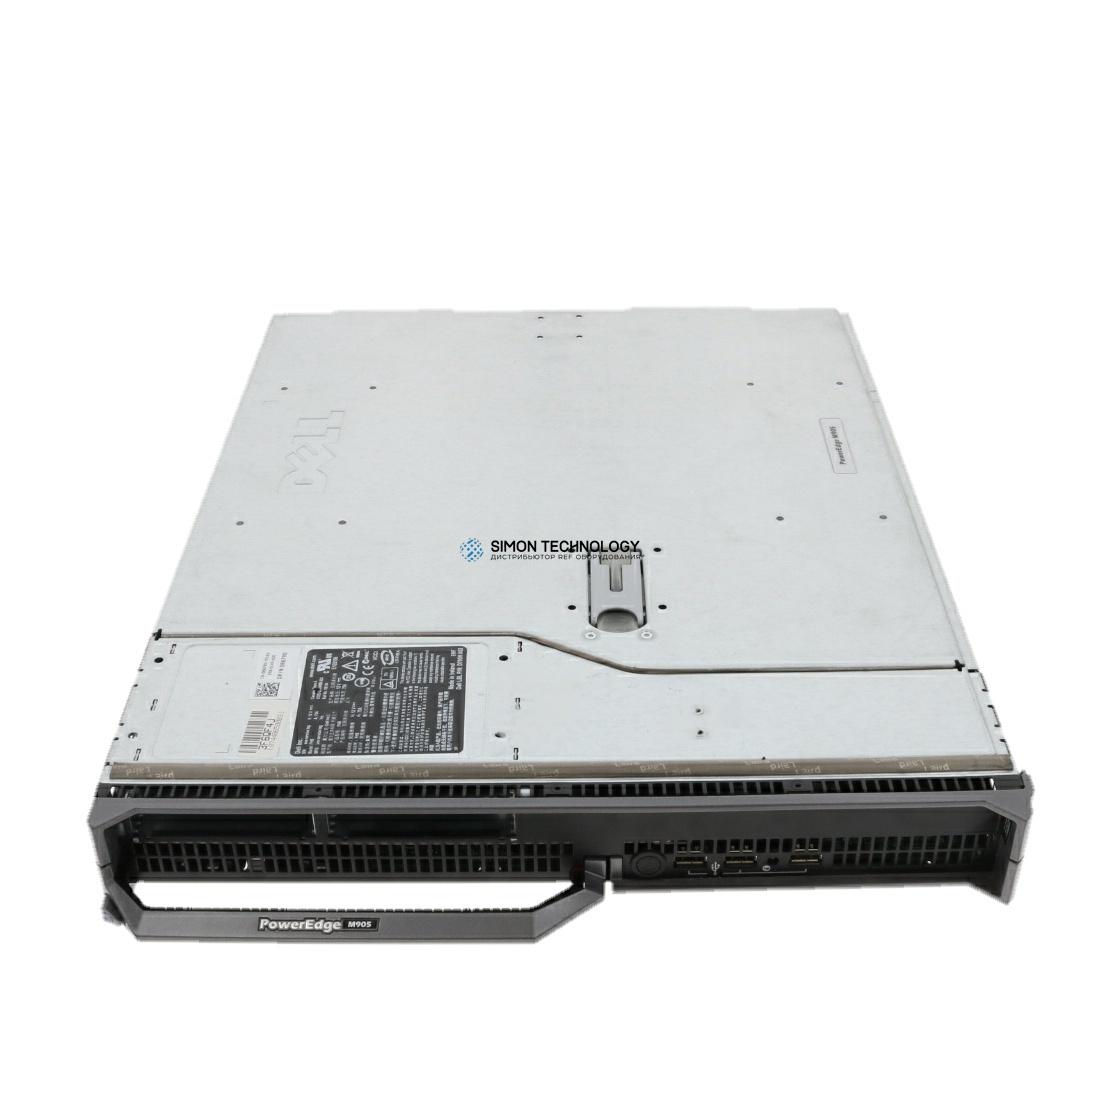 Сервер Dell PowerEdge M905 W370K Ask for custom qoute (PEM905-W370K)